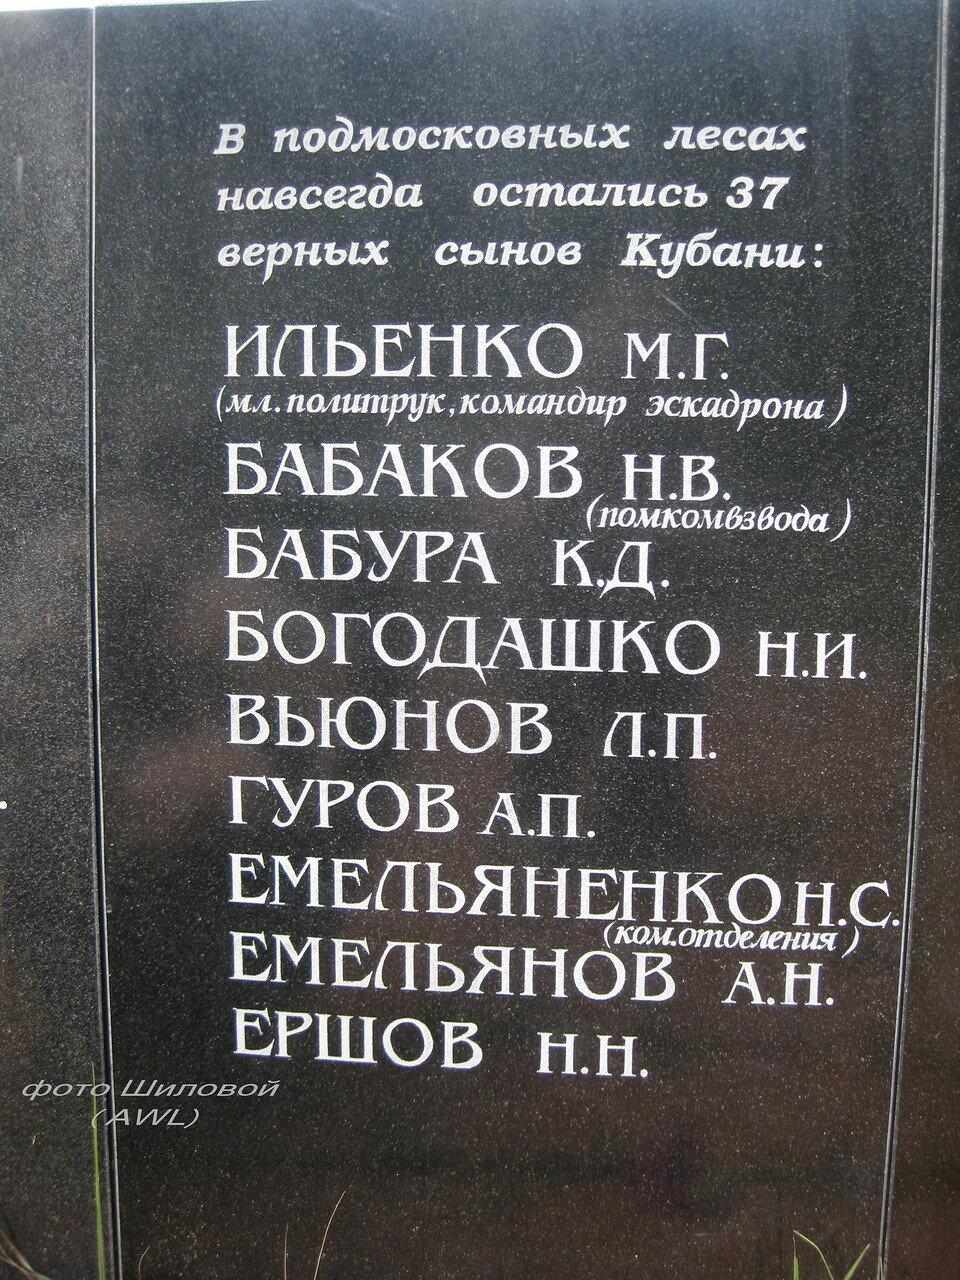 https://img-fotki.yandex.ru/get/113961/199368979.1c/0_1bdf4c_b981d132_XXXL.jpg